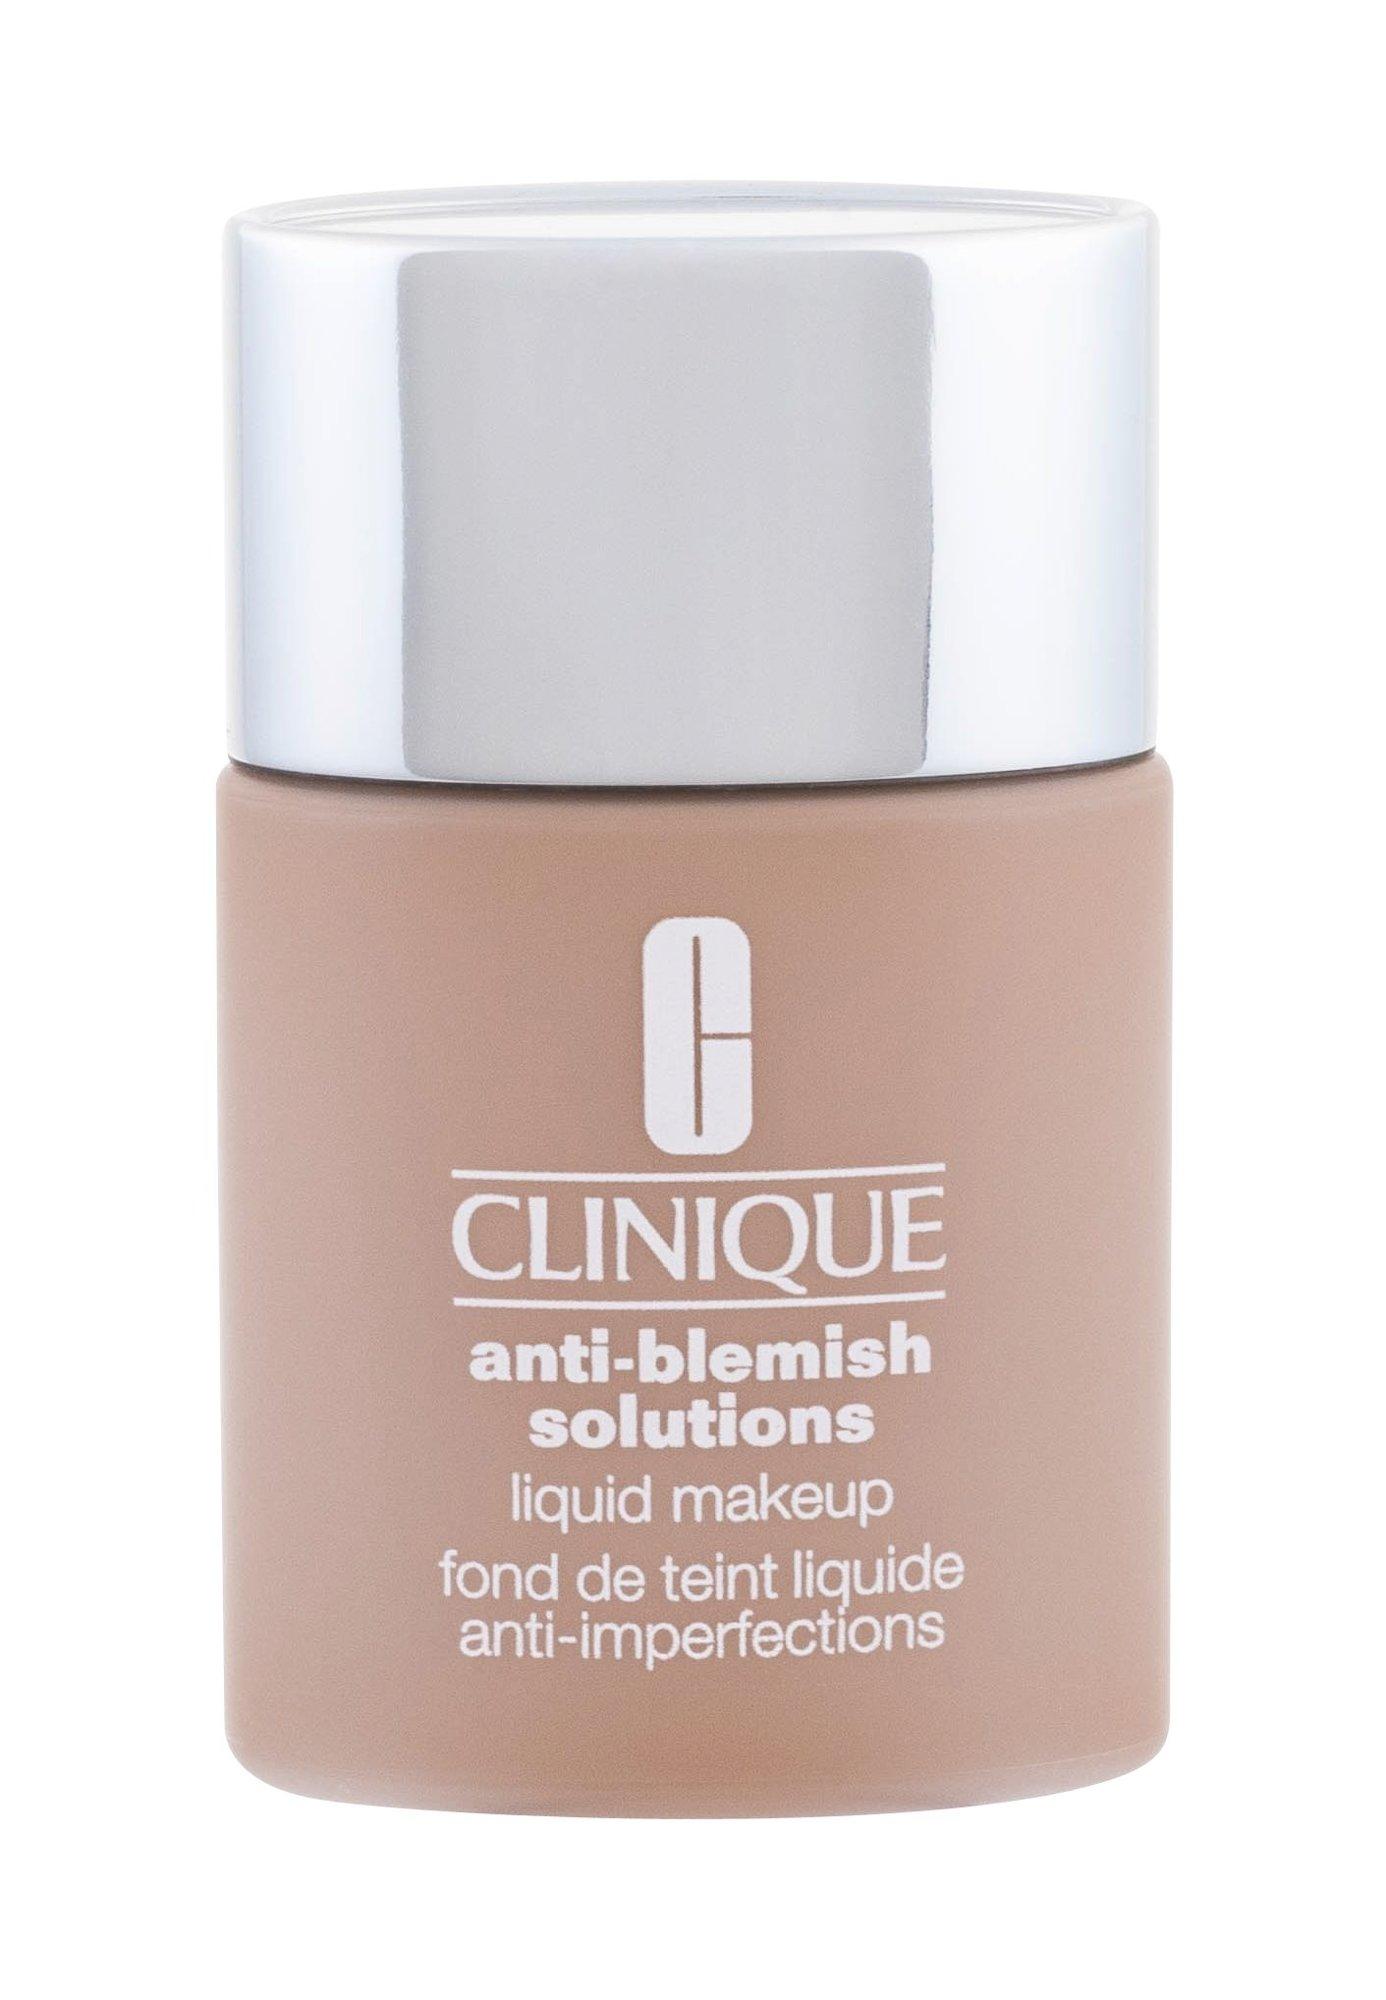 Clinique Anti-Blemish Solutions Cosmetic 30ml 04 Fresh Vanilla